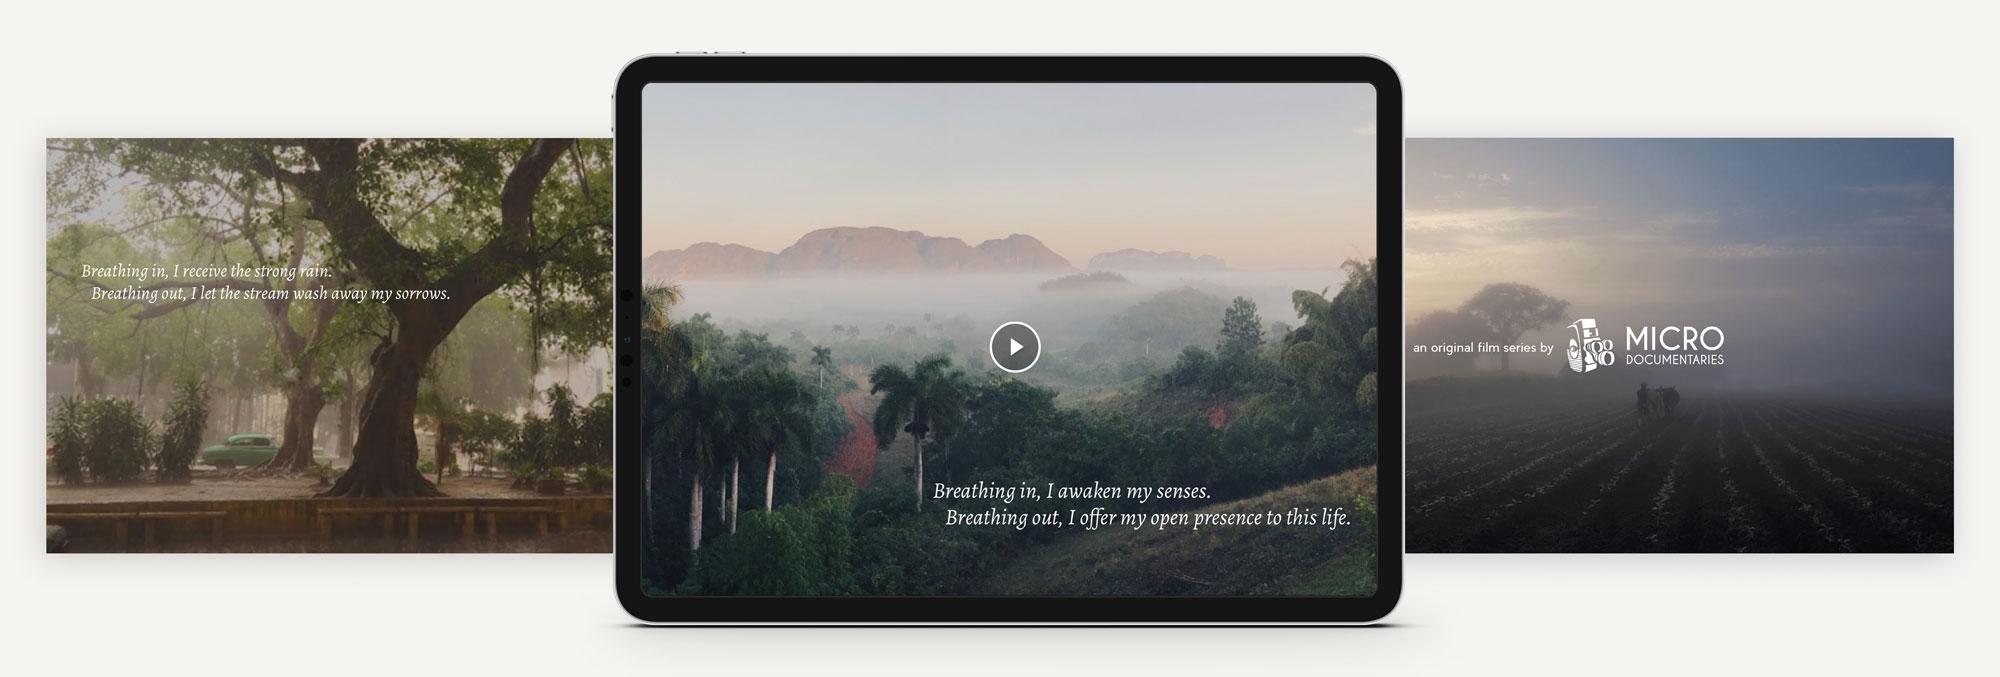 Imancenia-Film-Titles-iPadPro